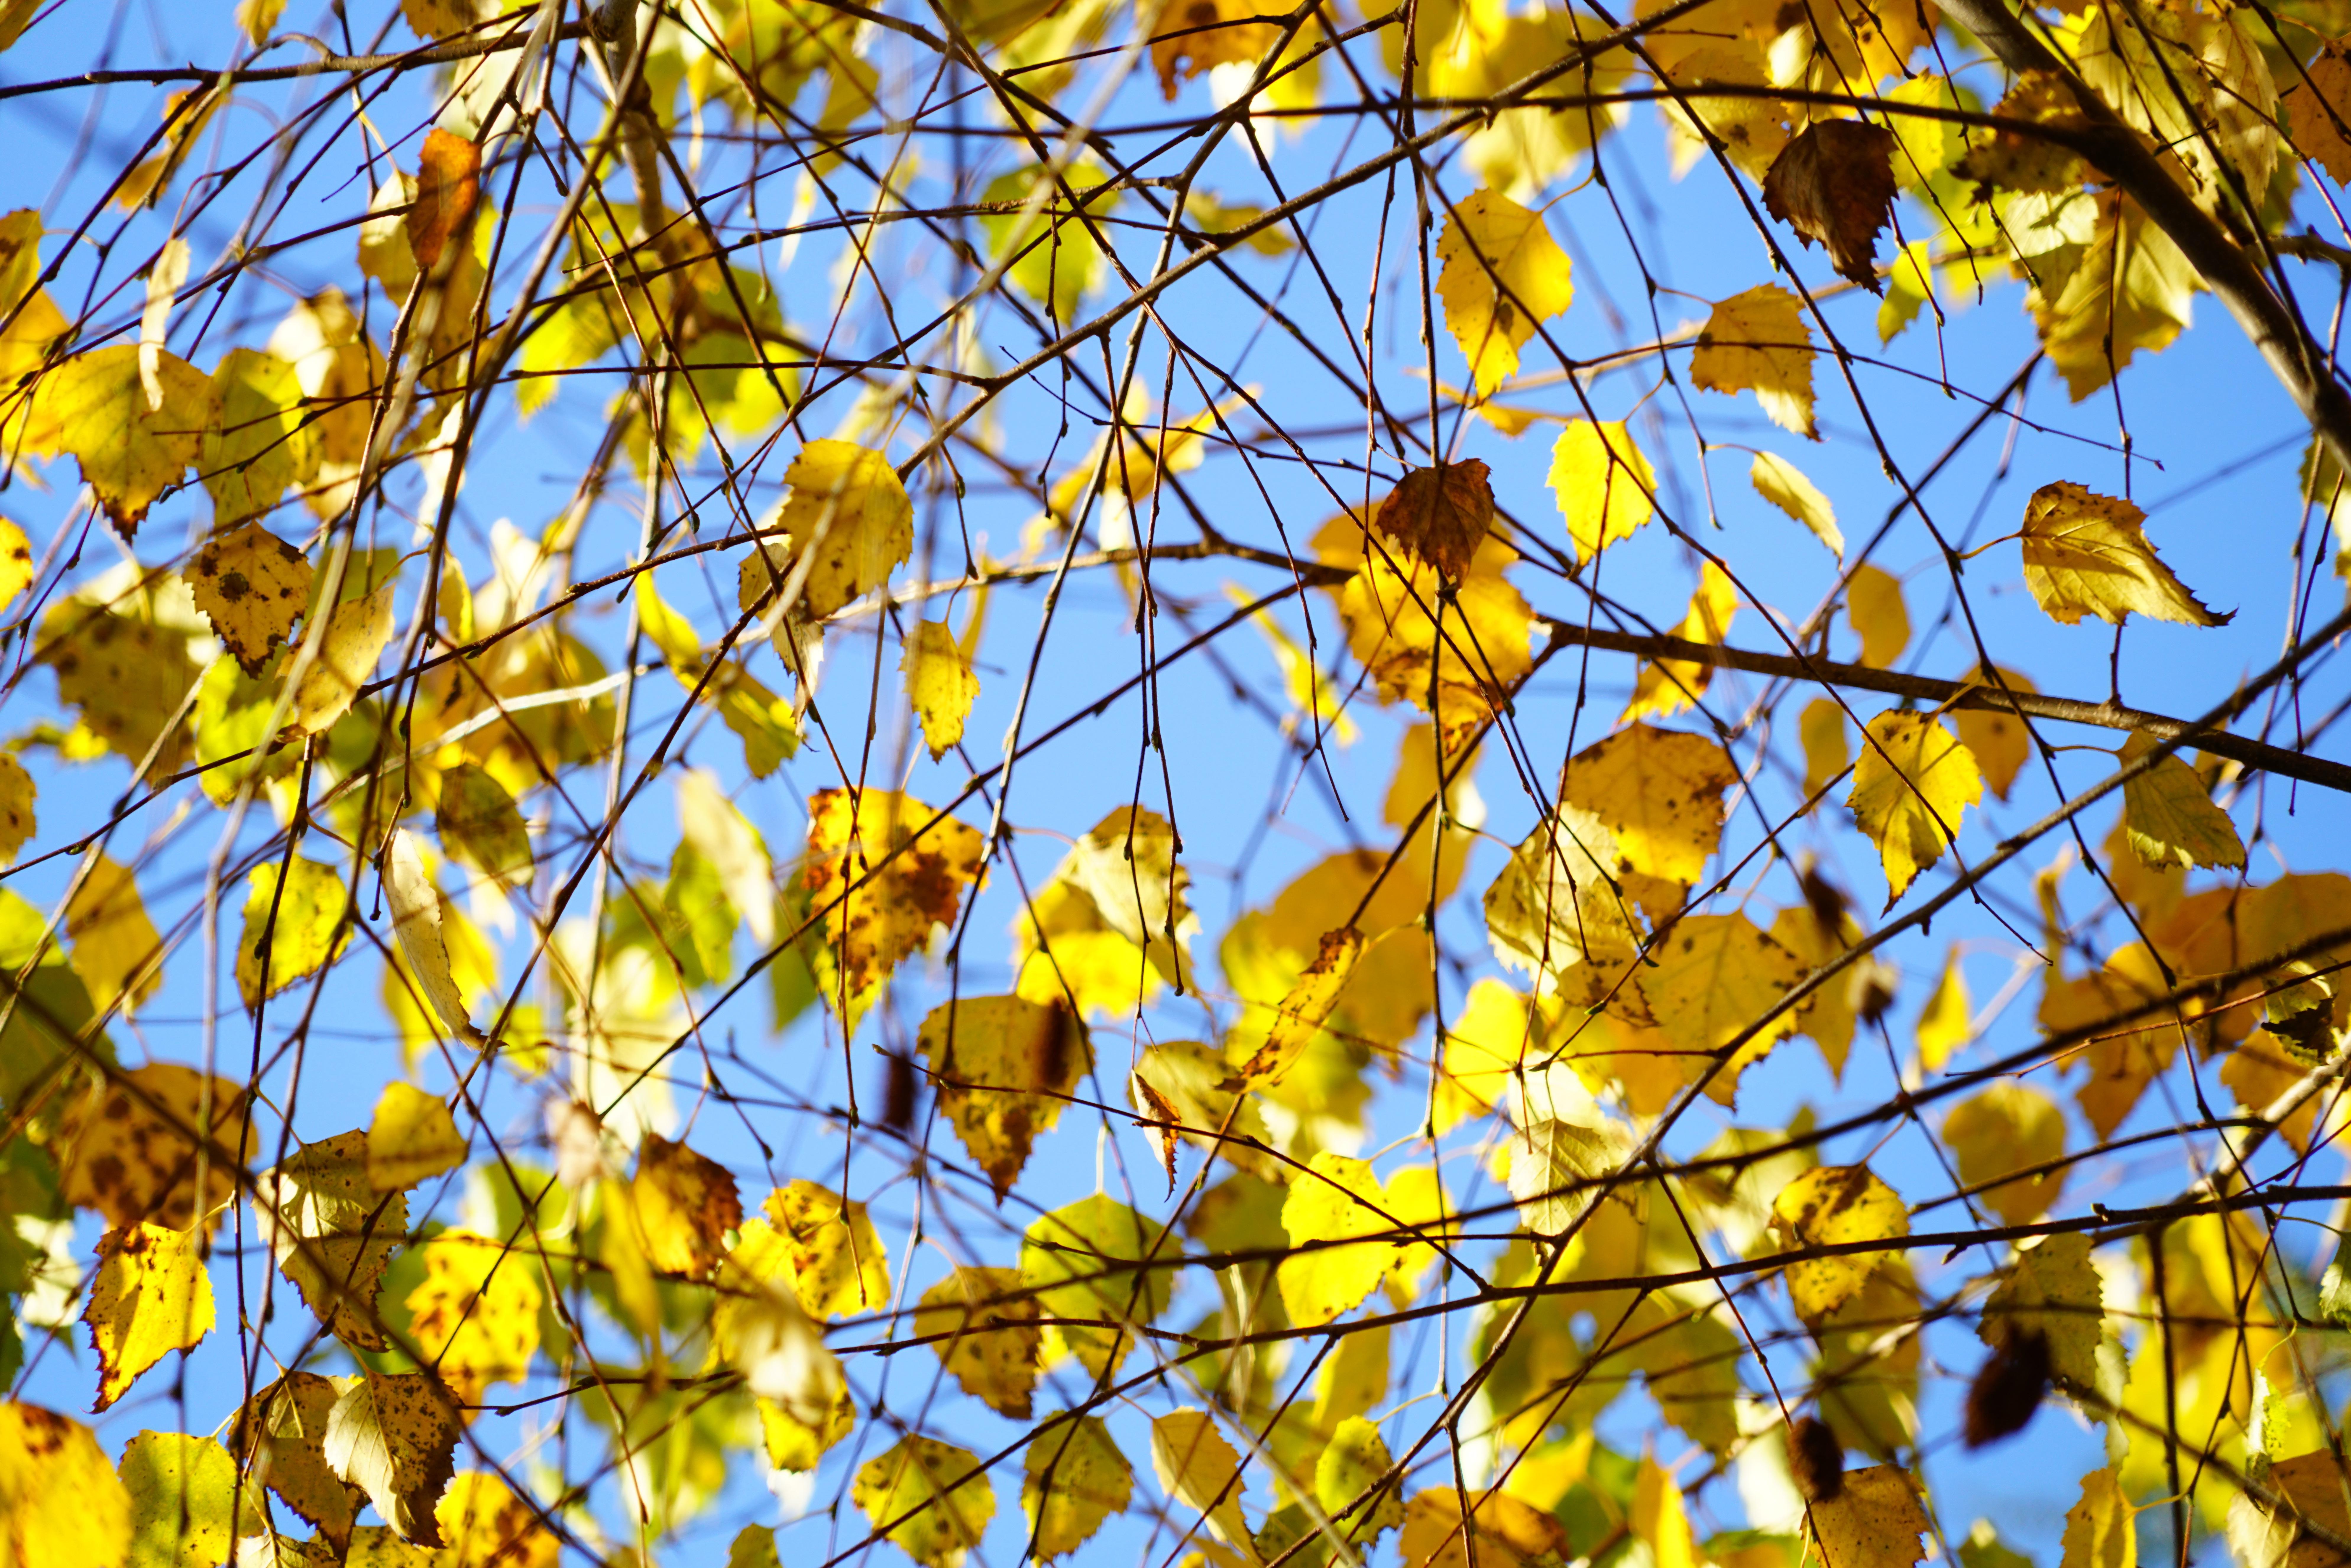 Free Images Branch Plant Sky Sunlight Leaf Spring Autumn